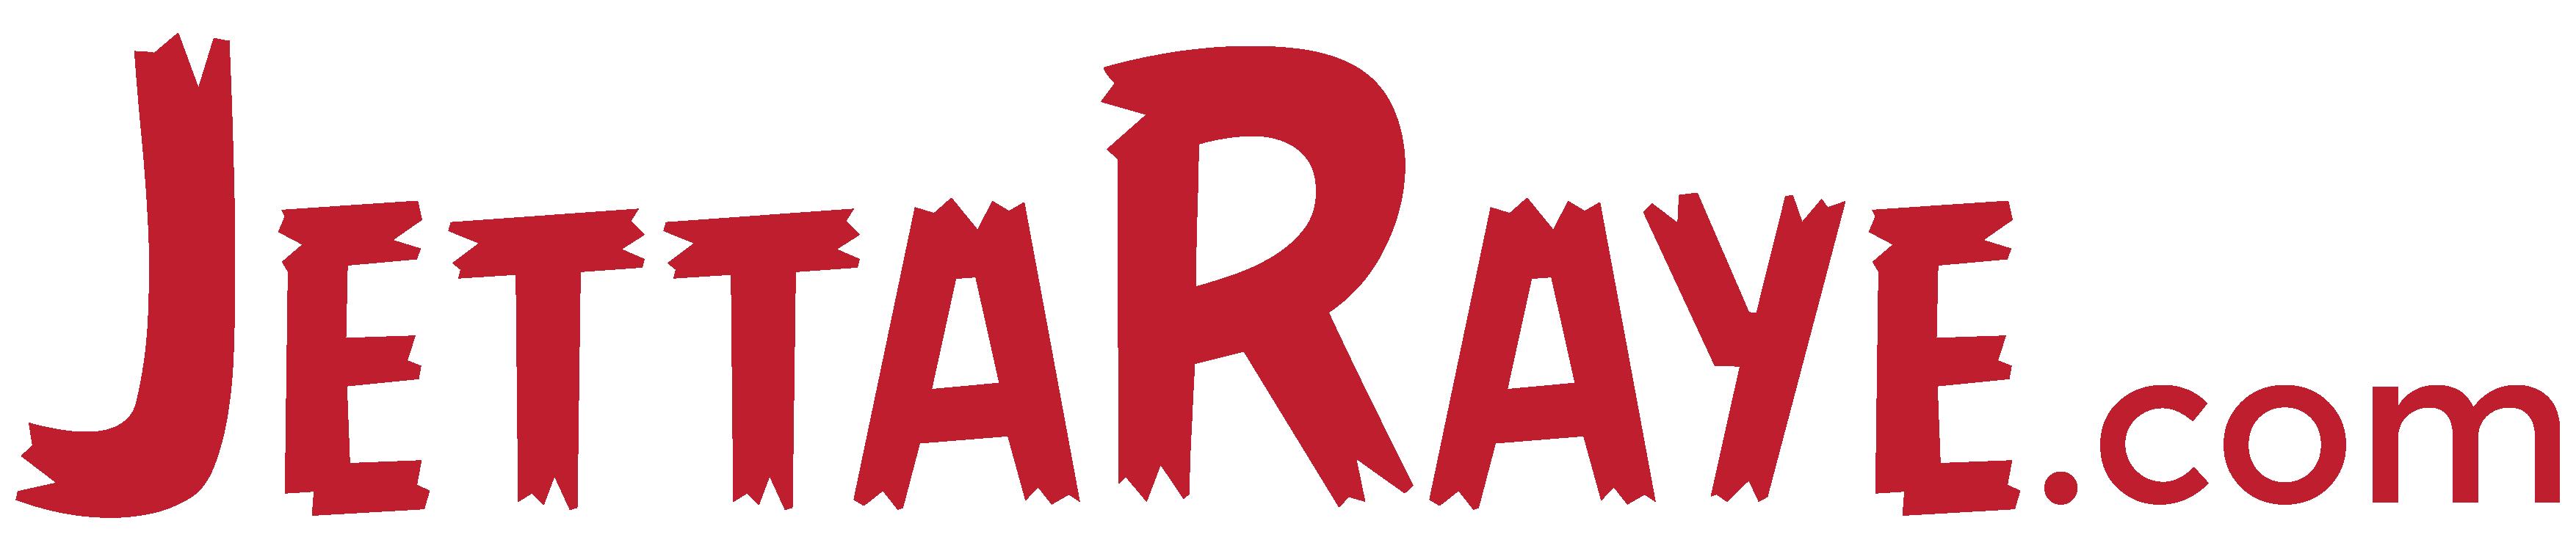 Official Jetta Raye Adventures website